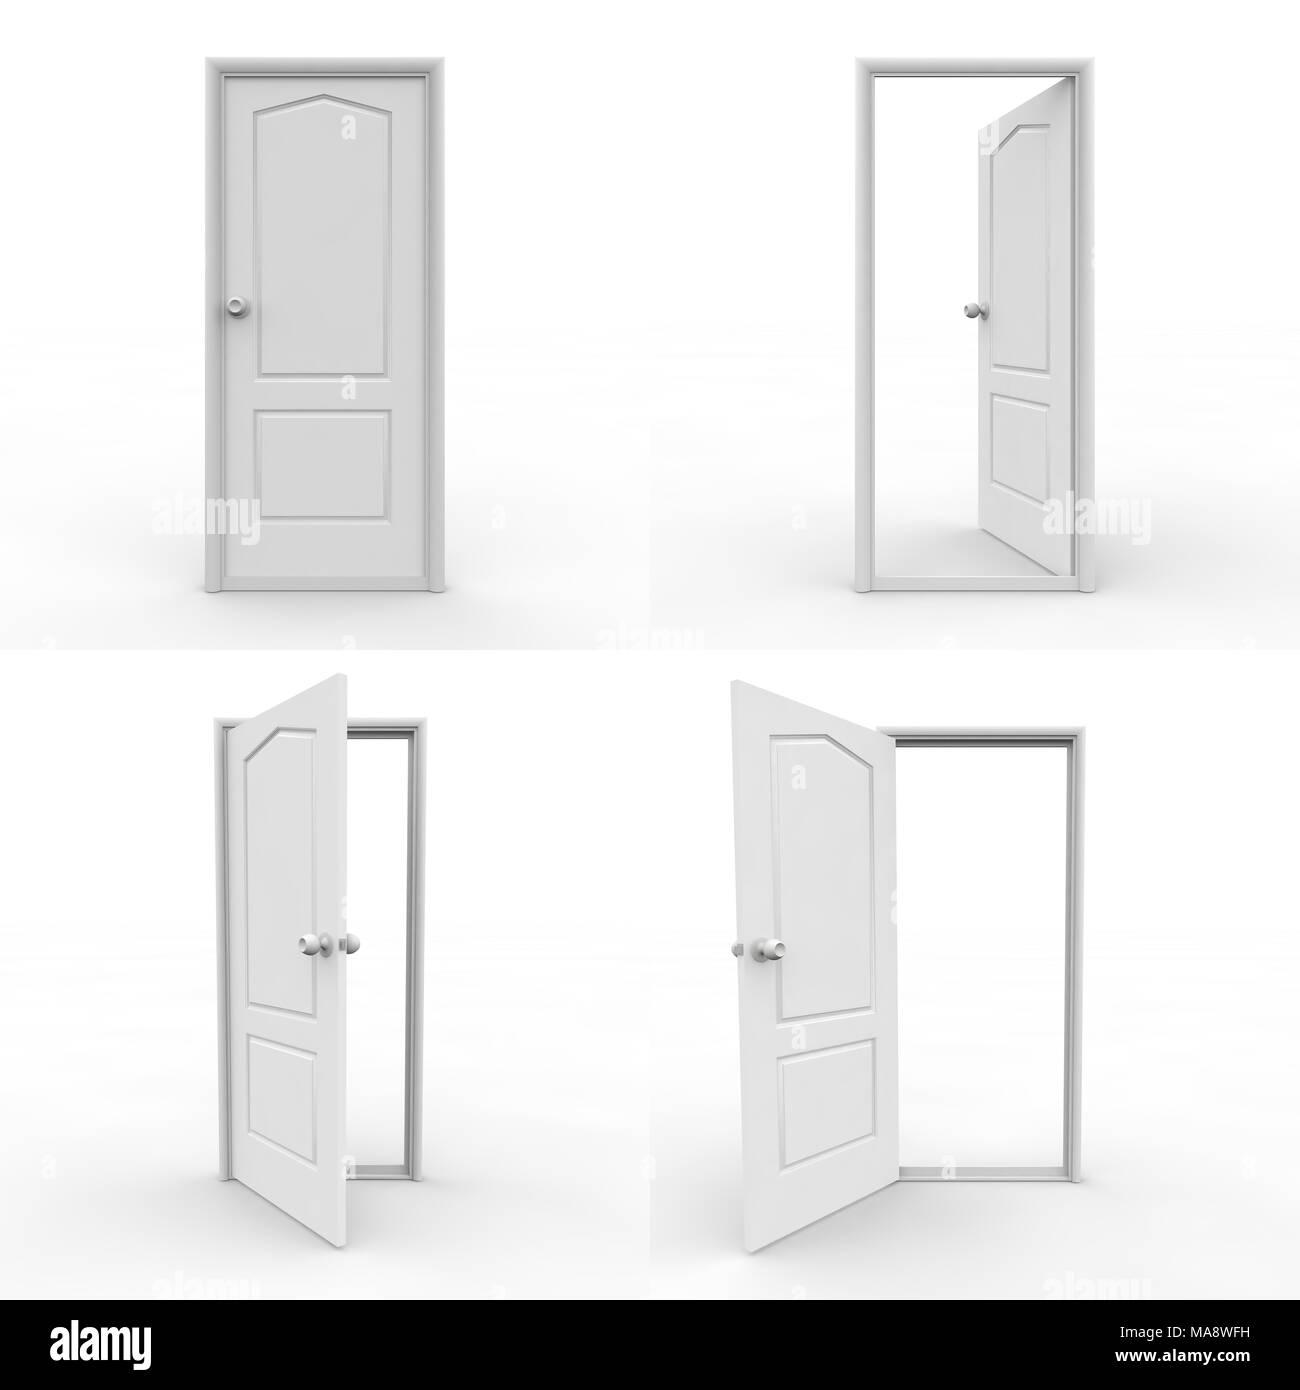 Set of wooden doors on white isolated background. 3D illustration Stock Photo